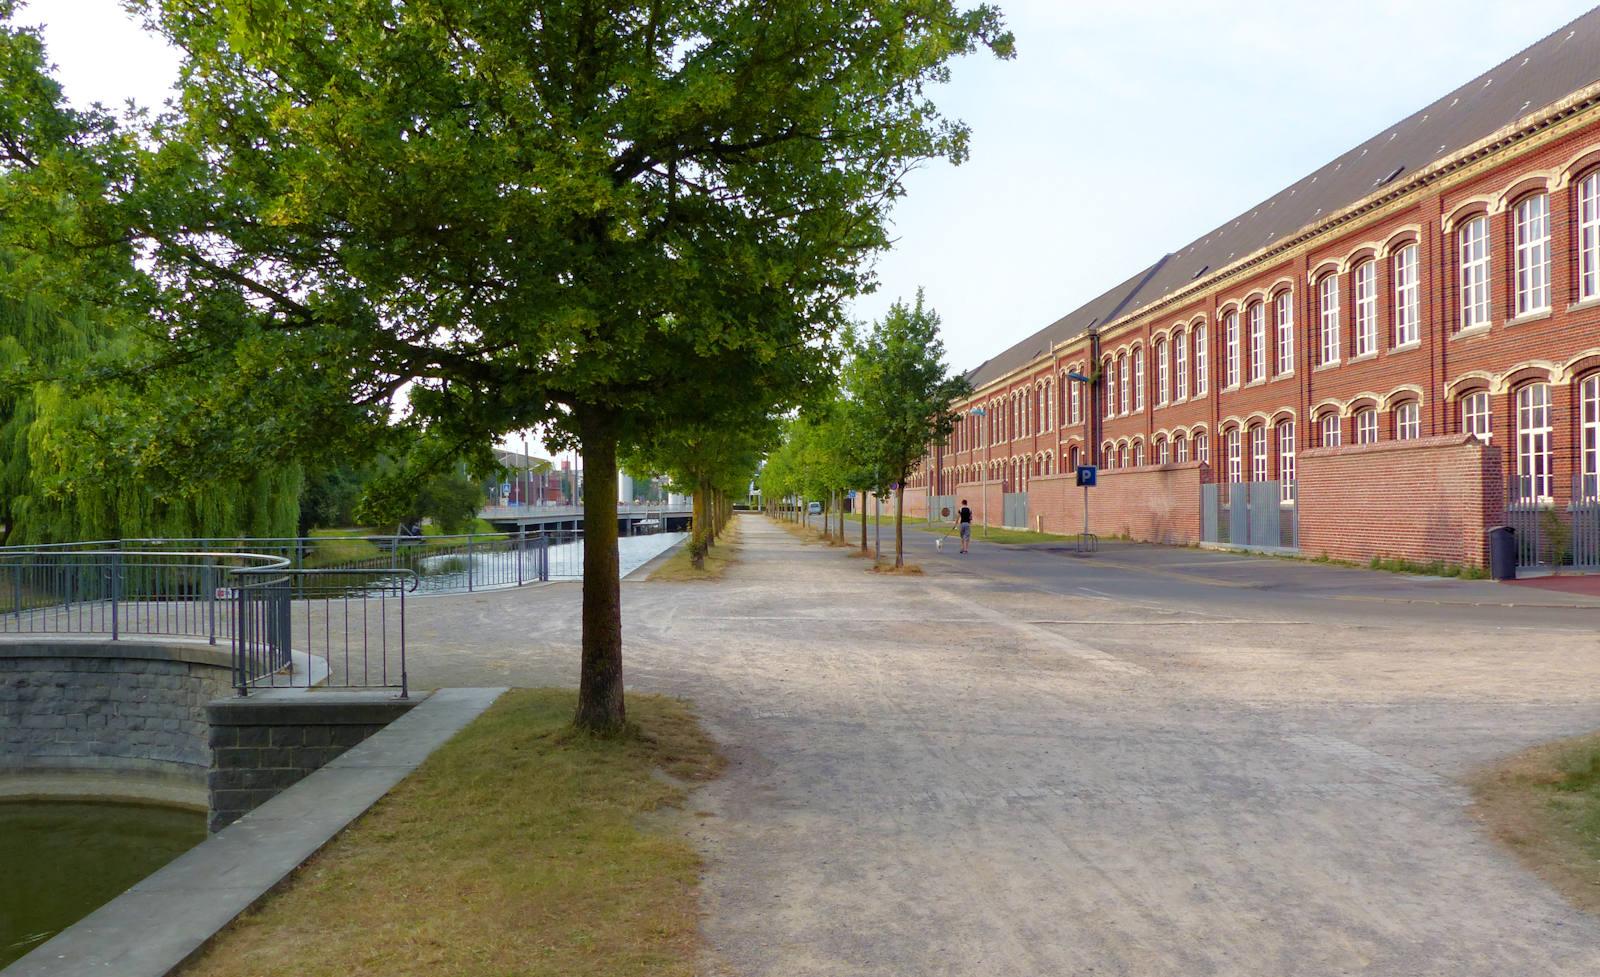 Lycée Gambetta Tourcoing - Canal de Tourcoing